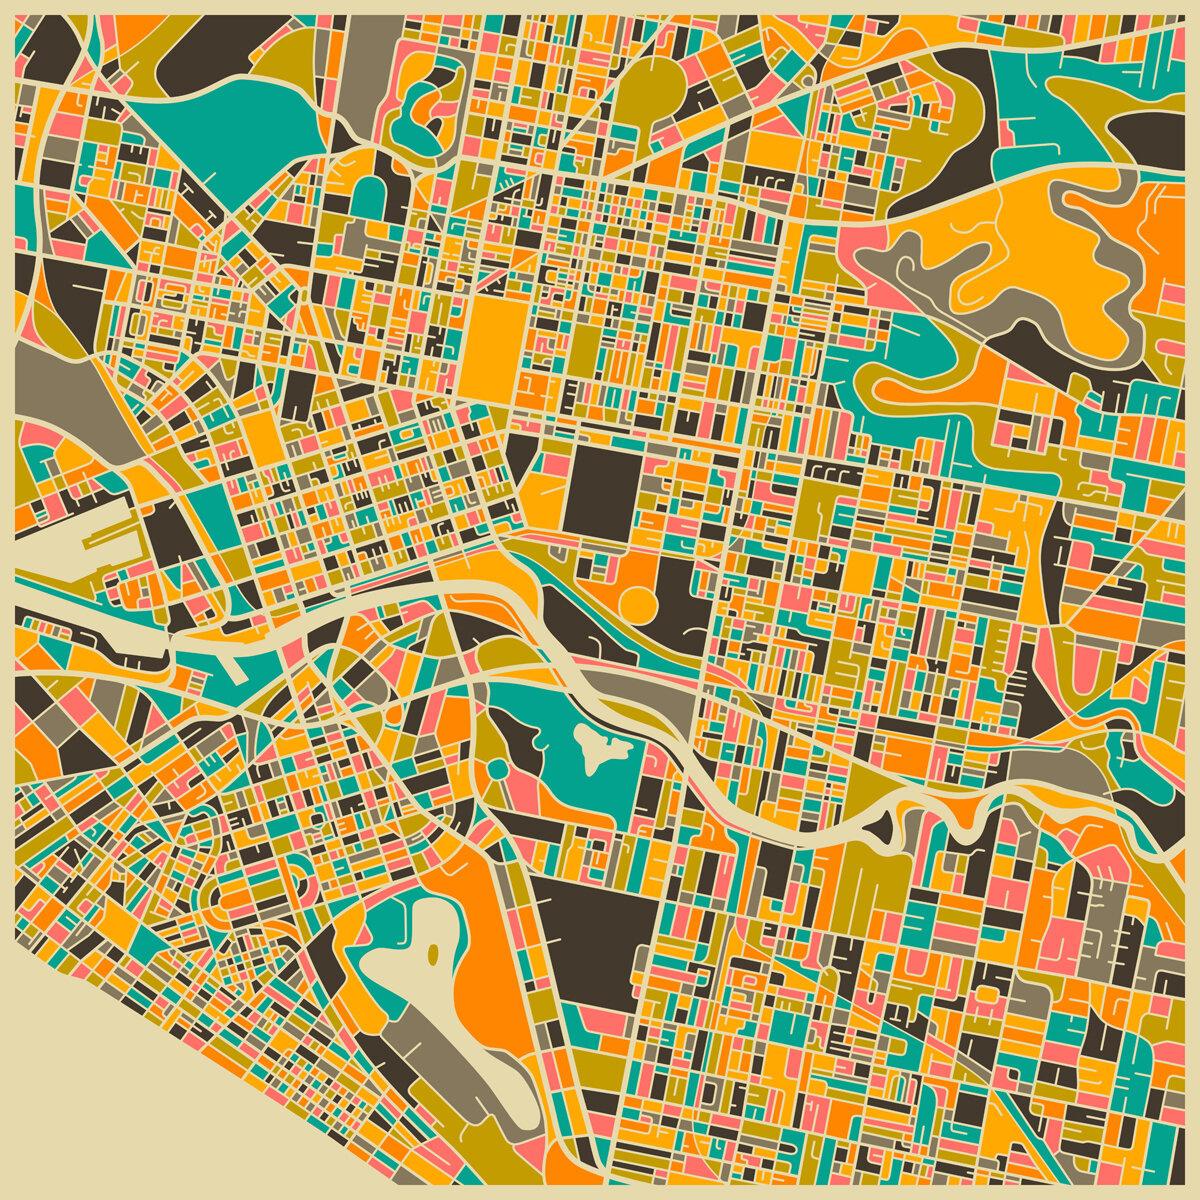 PrestigeArtStudios Melbourne Retro Map Graphic Art | Wayfair